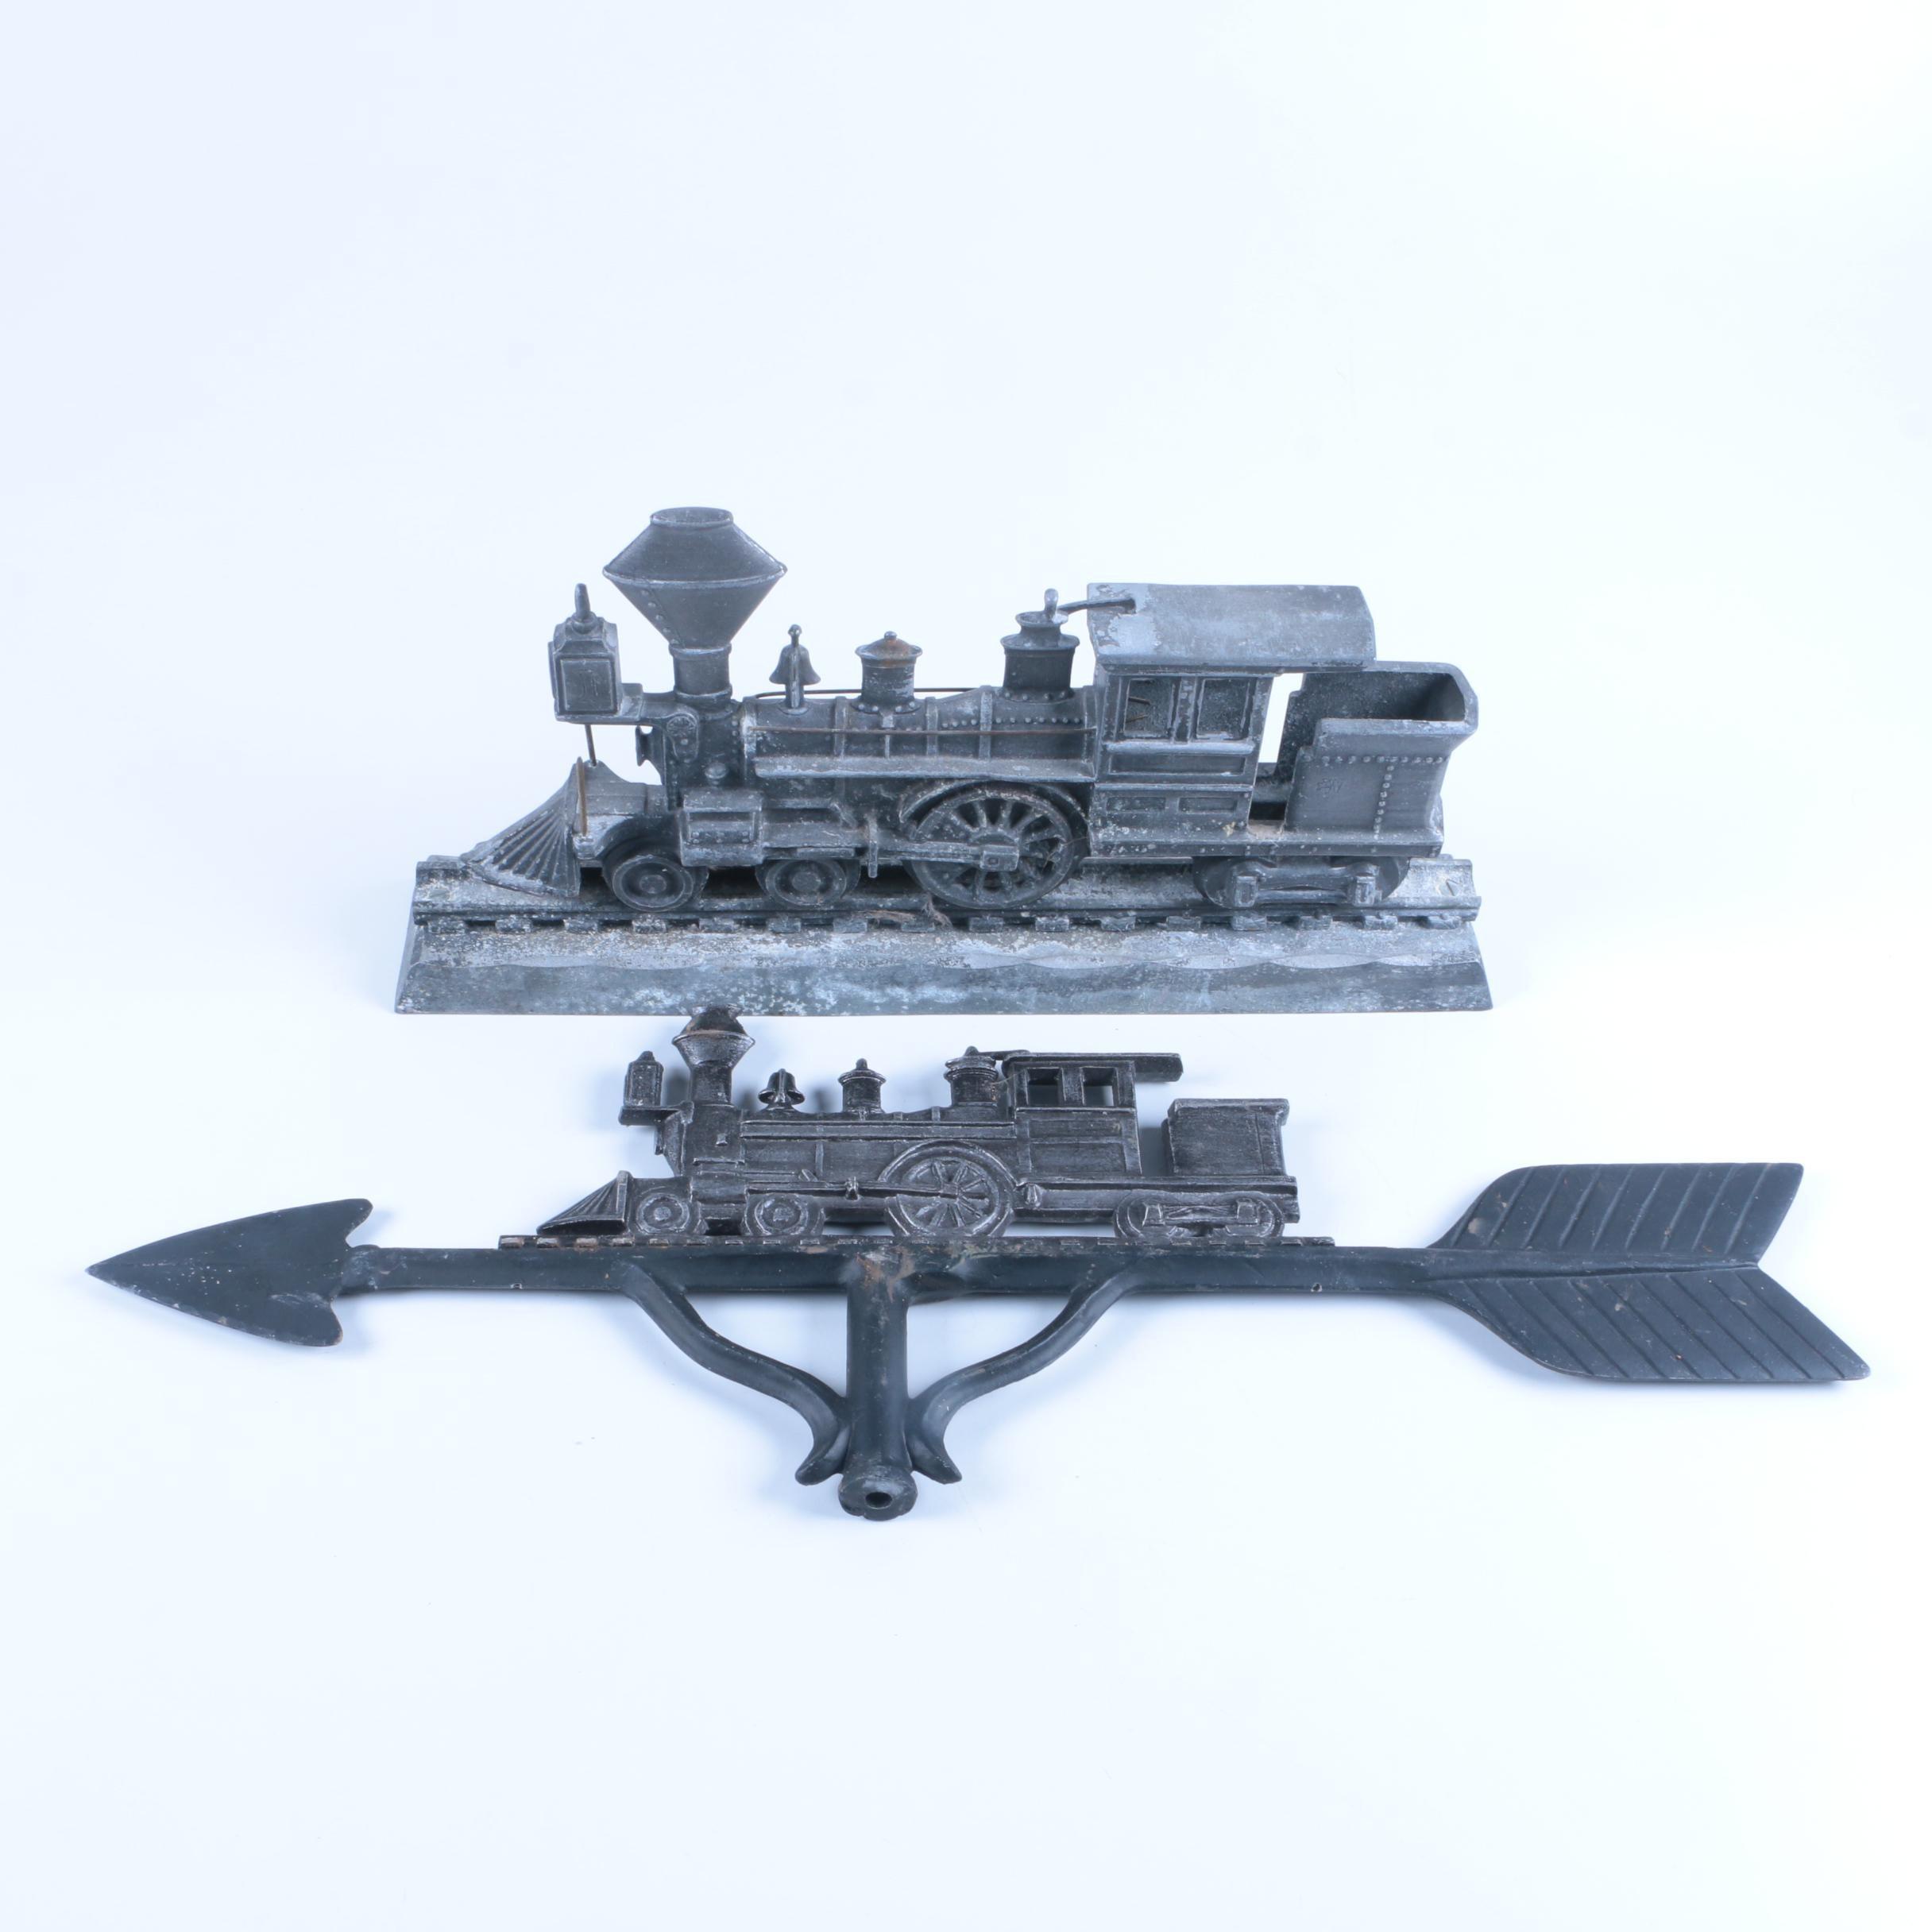 Cast Iron Train Engine Weathervane and Casting